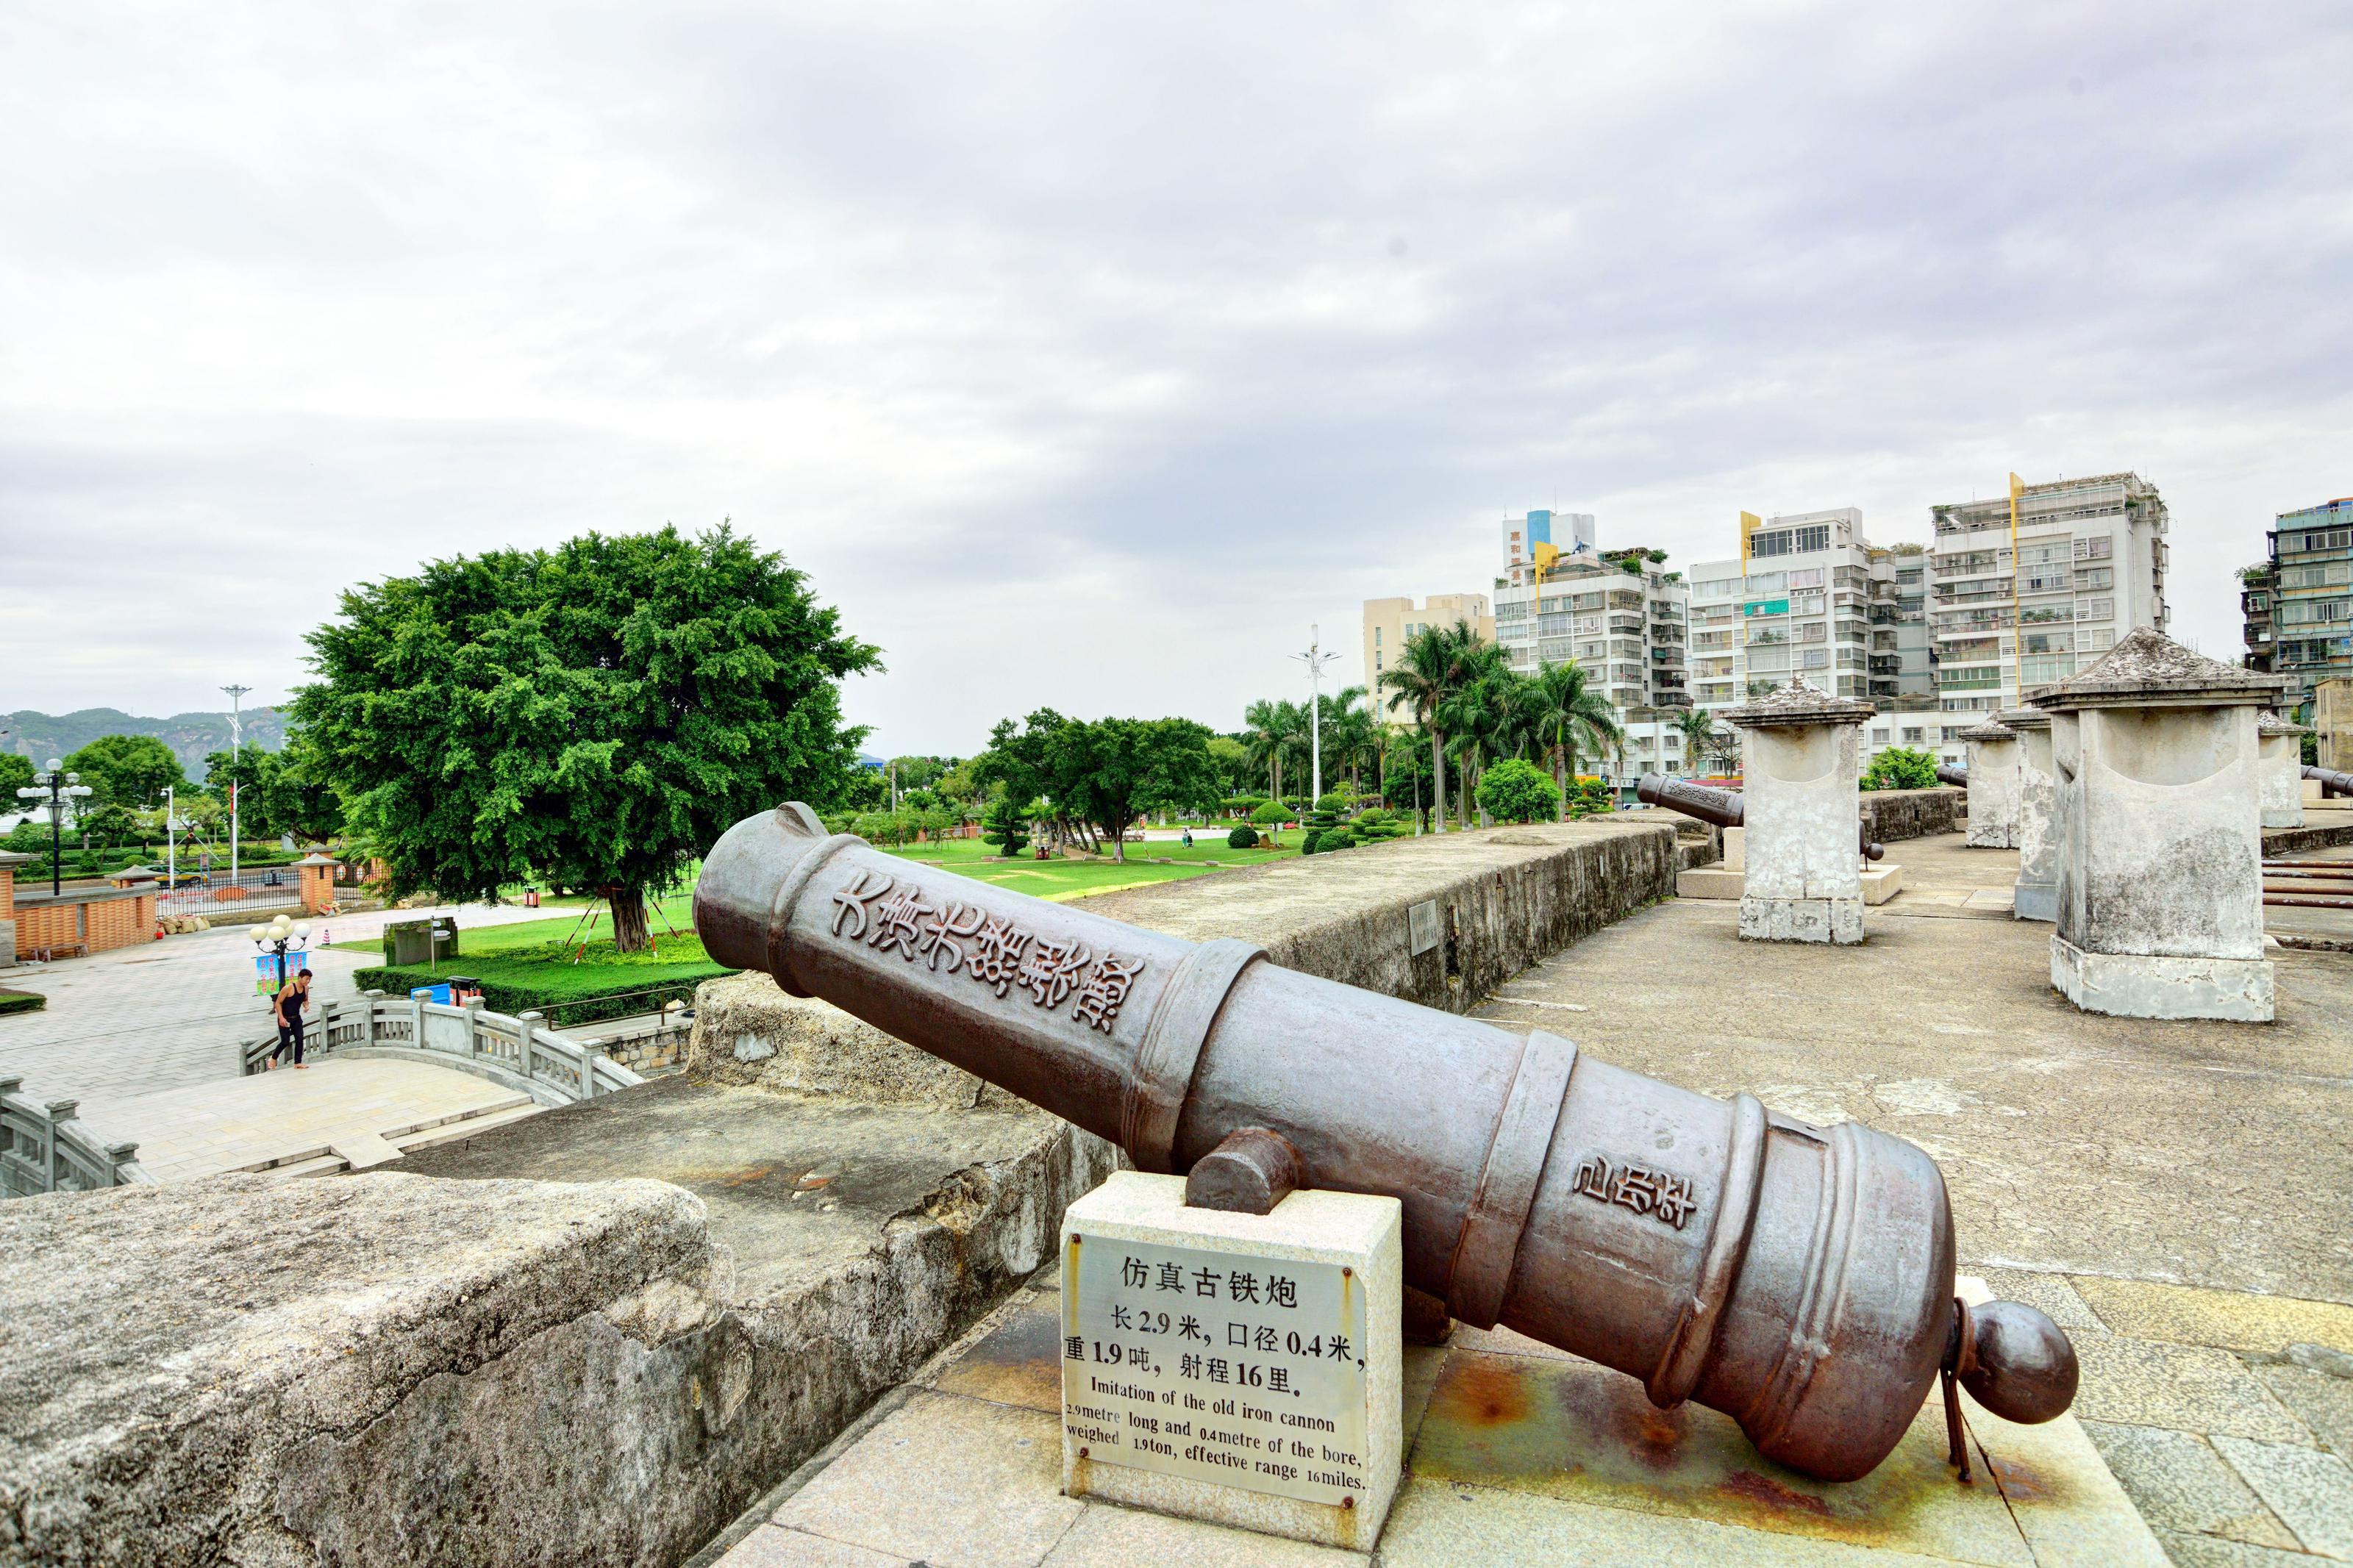 Shipaotai Park (Park of Stone Barbette)